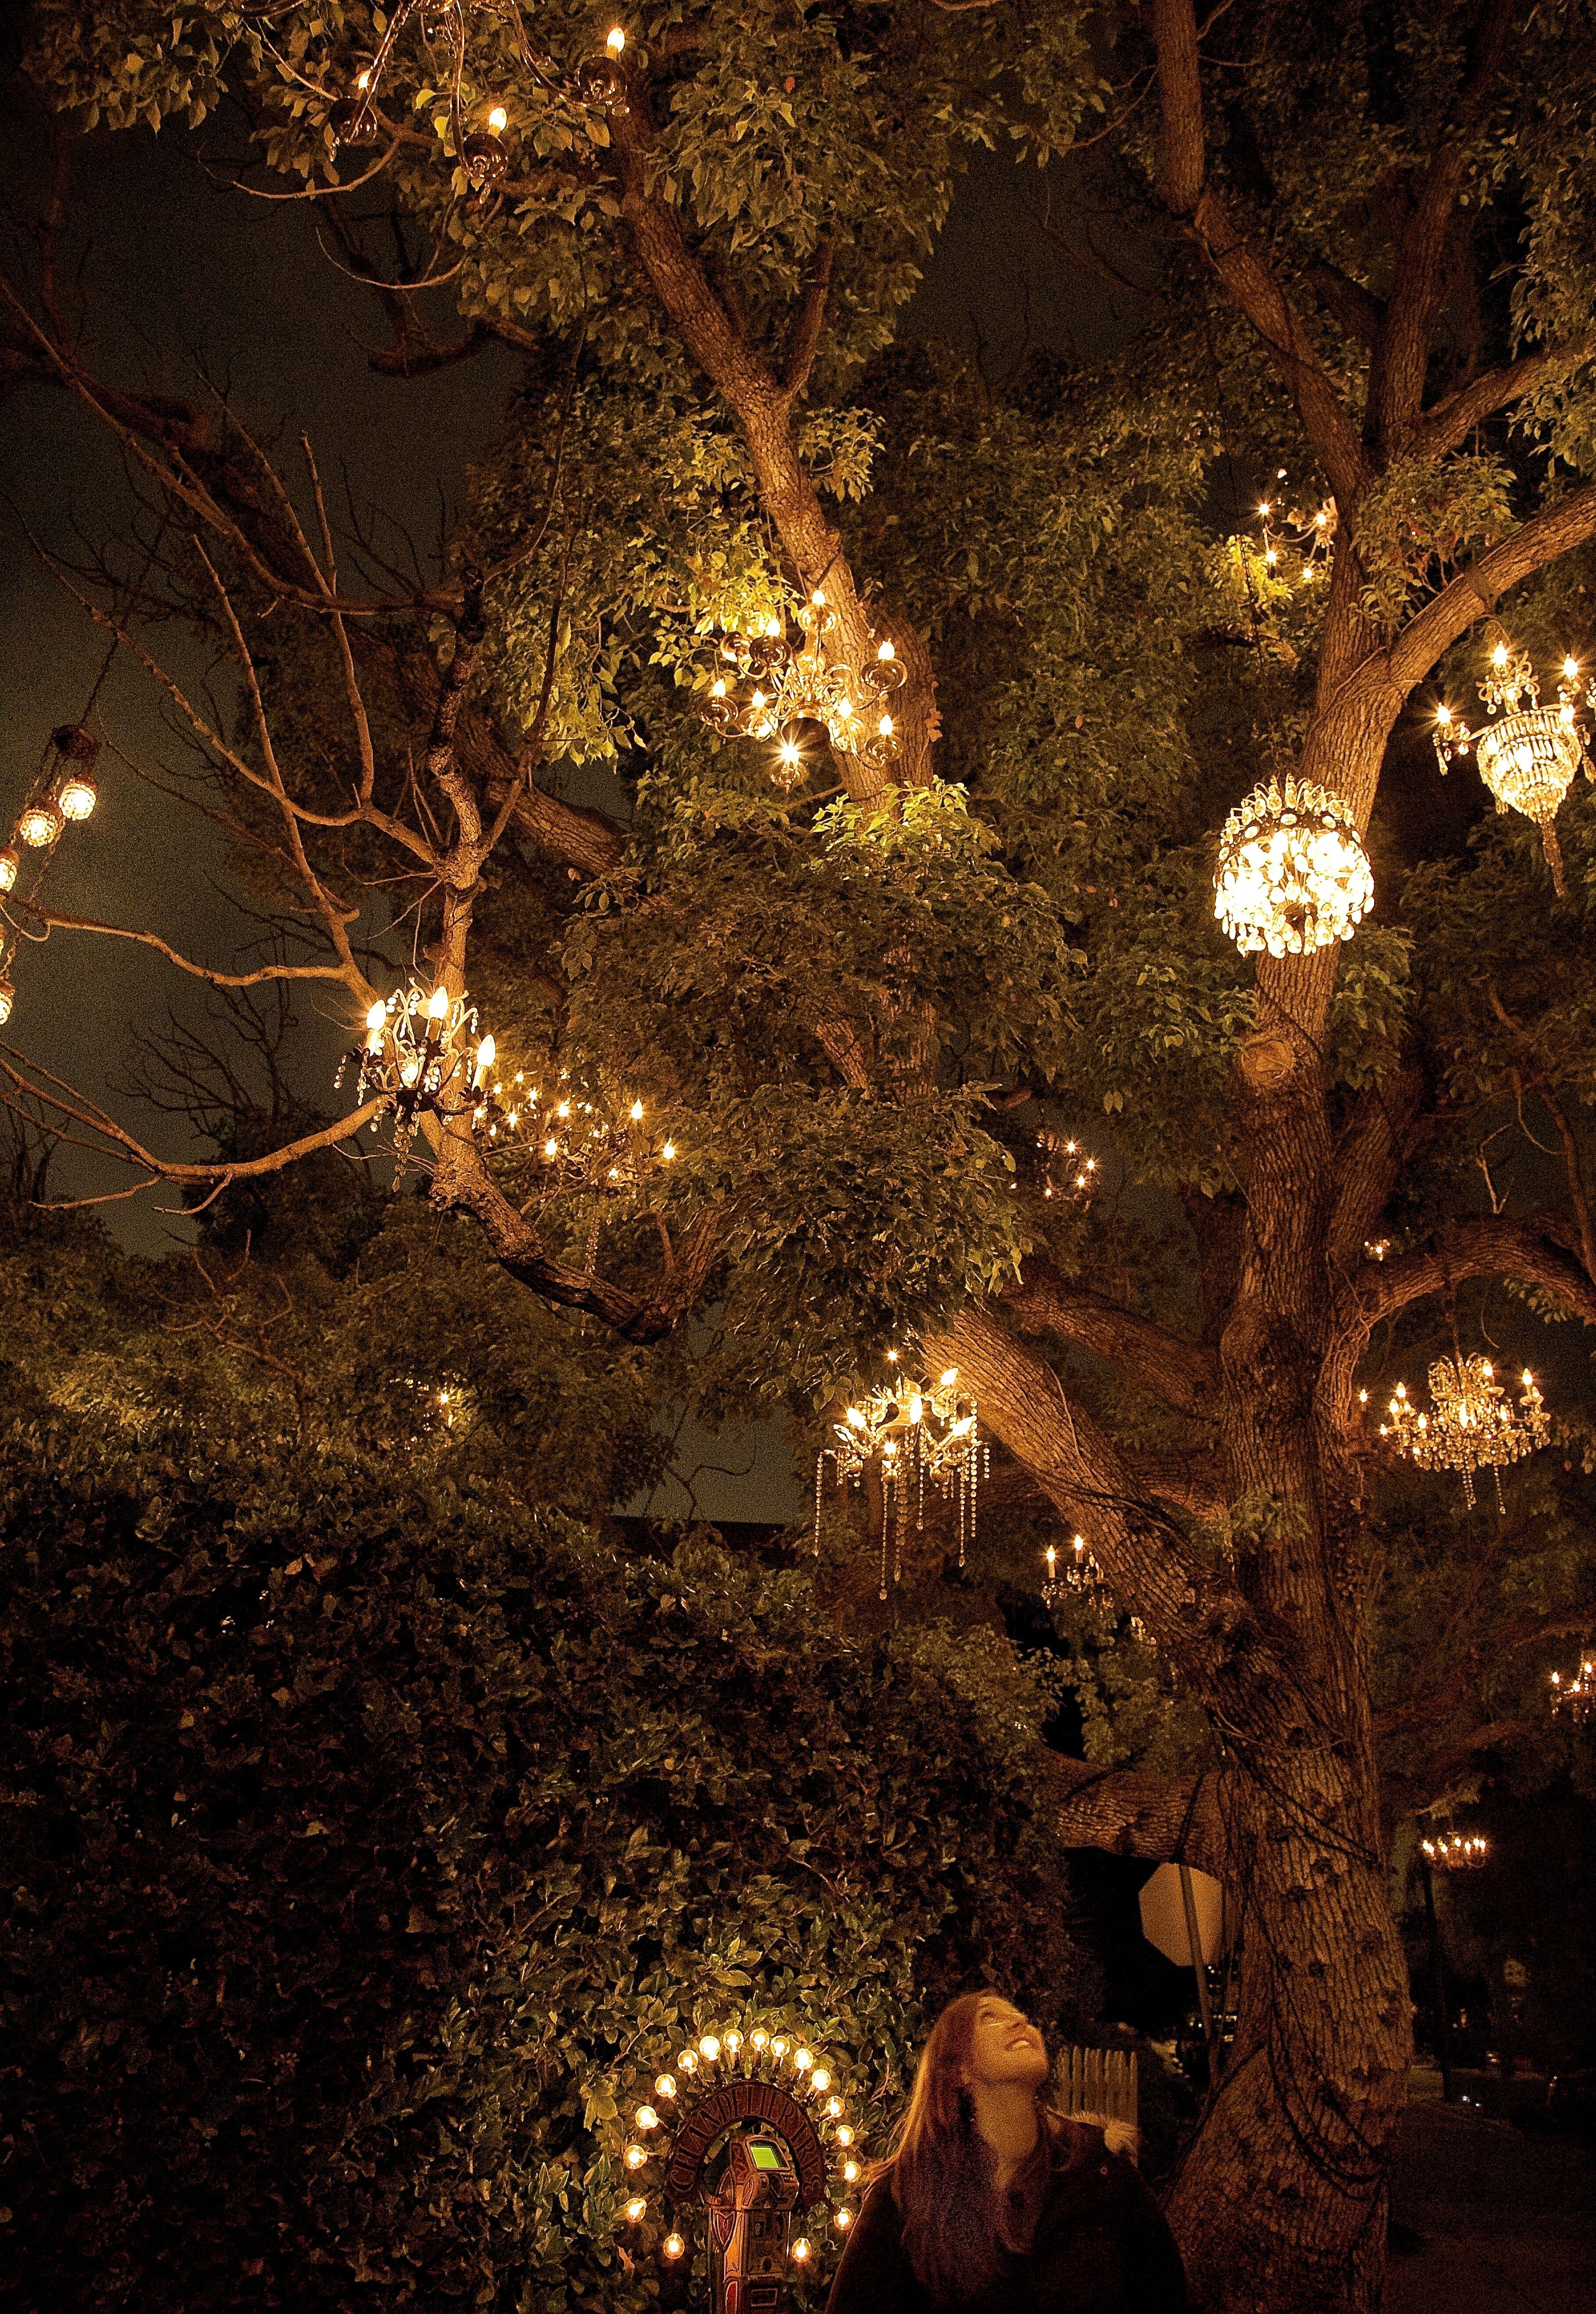 5. Chandelier Tree